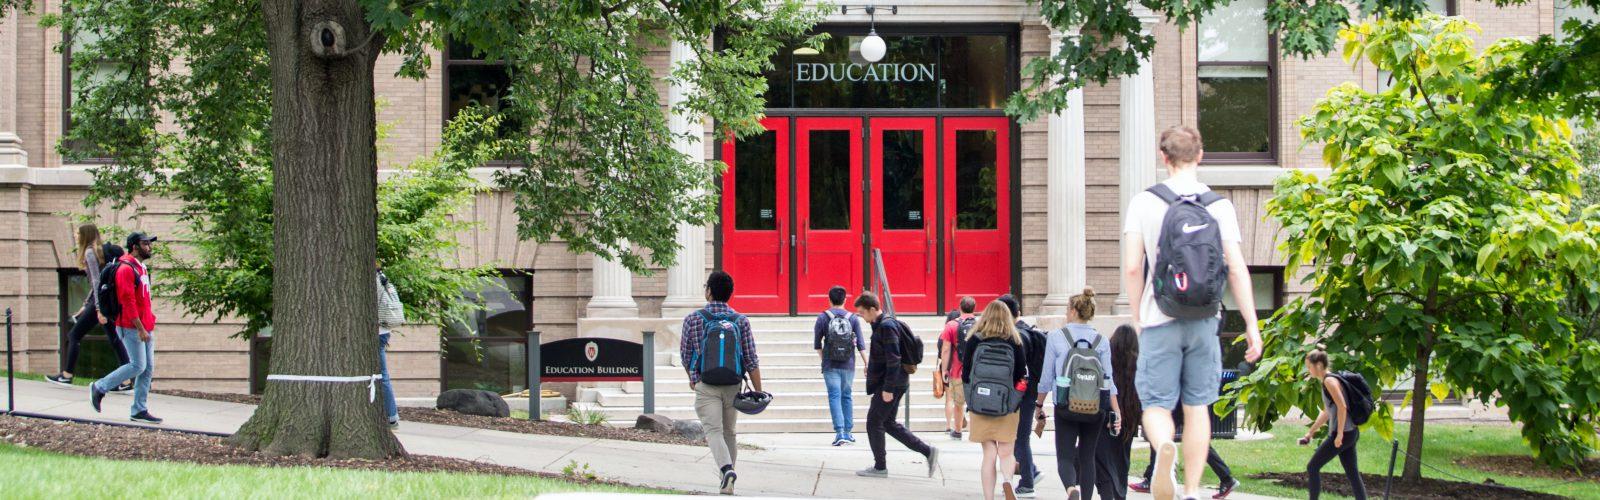 Education Building doors